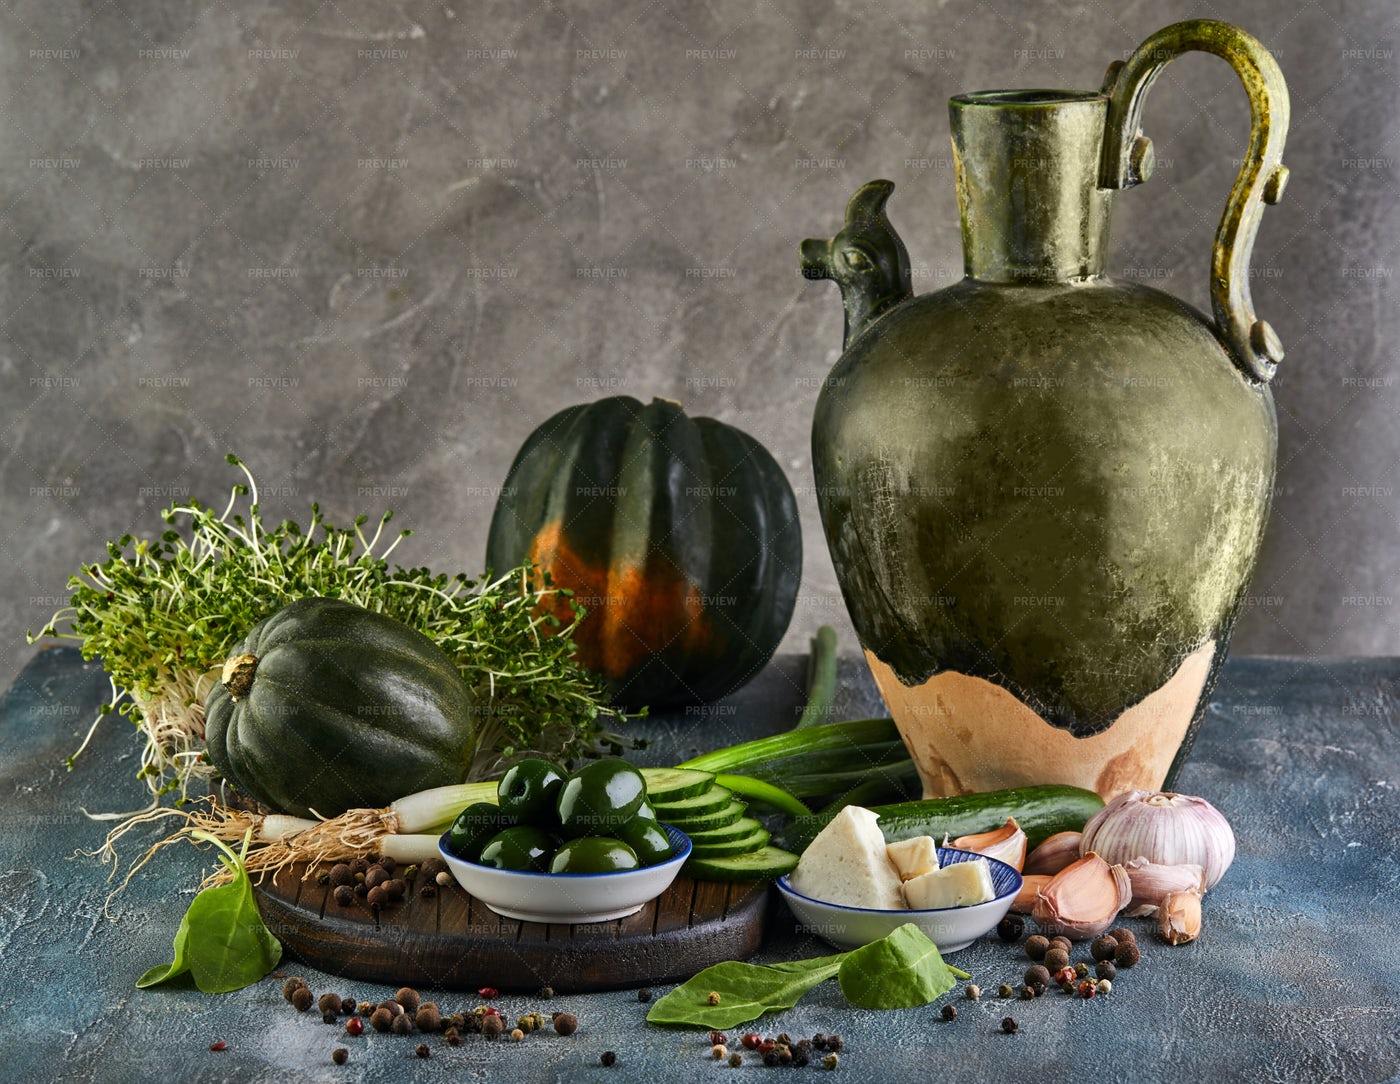 Big Jug Beside Vegetables: Stock Photos